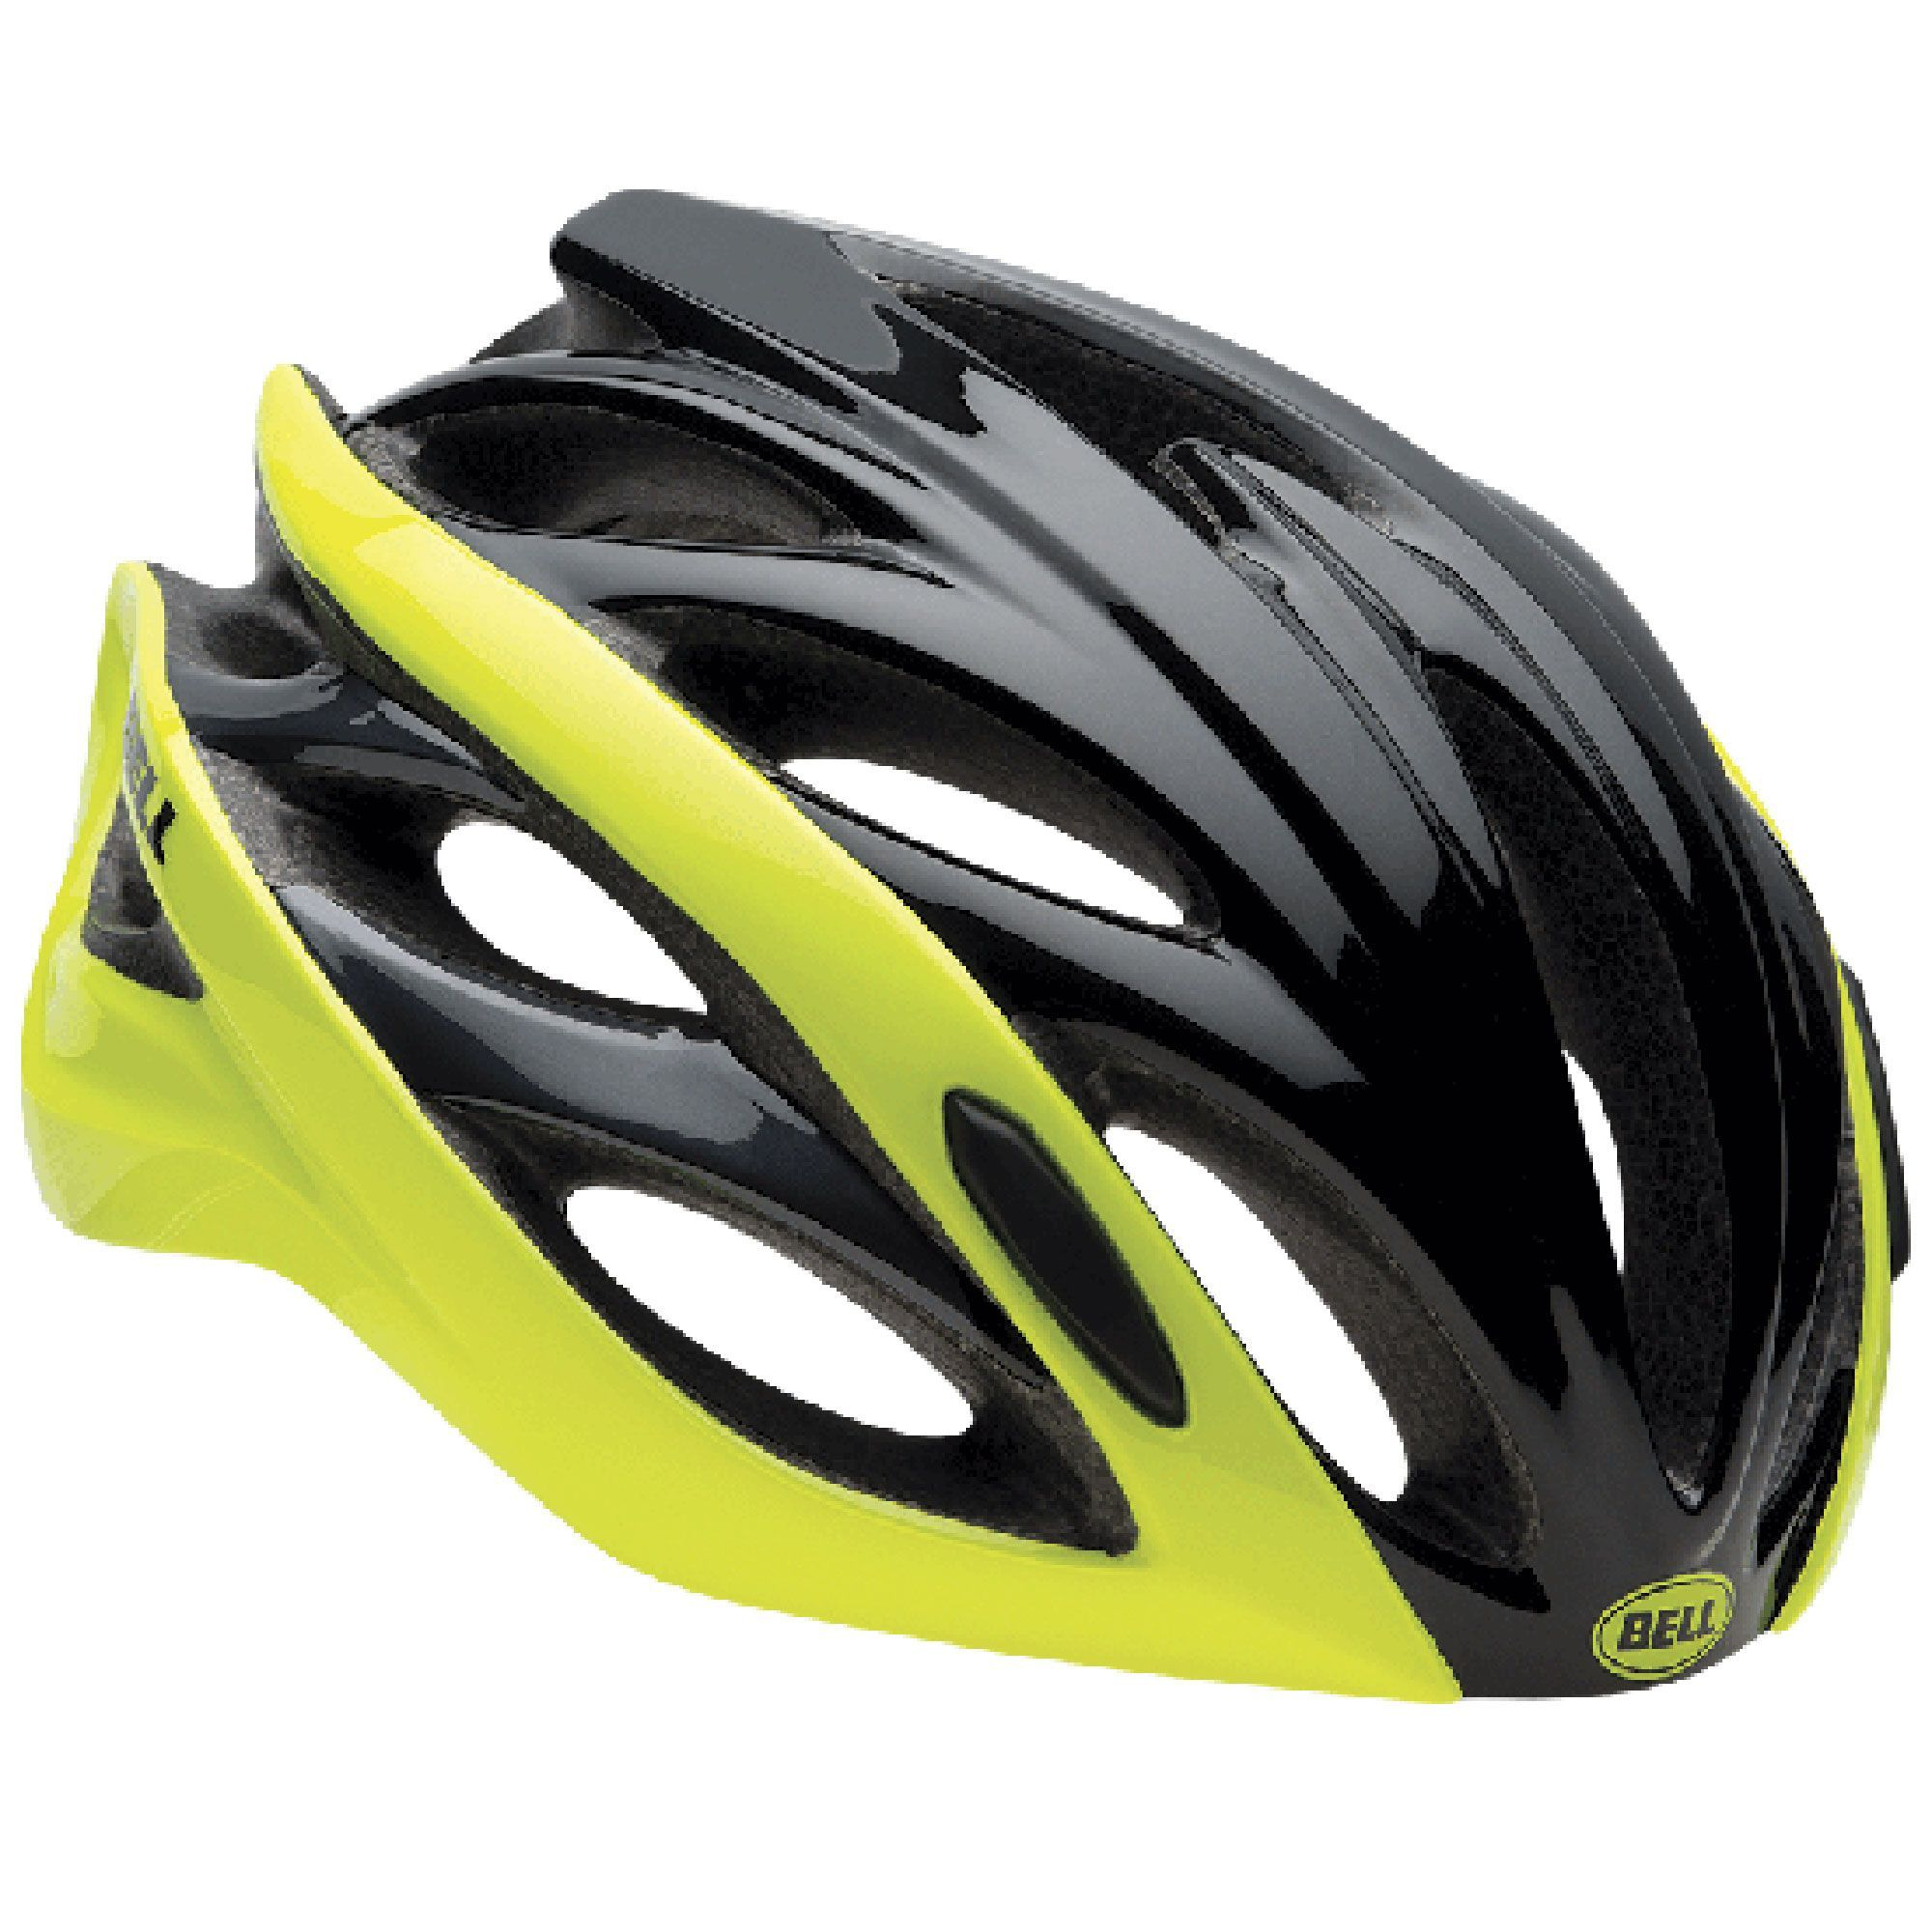 Bell Overdrive bicicleta bicicleta casco negro 2017